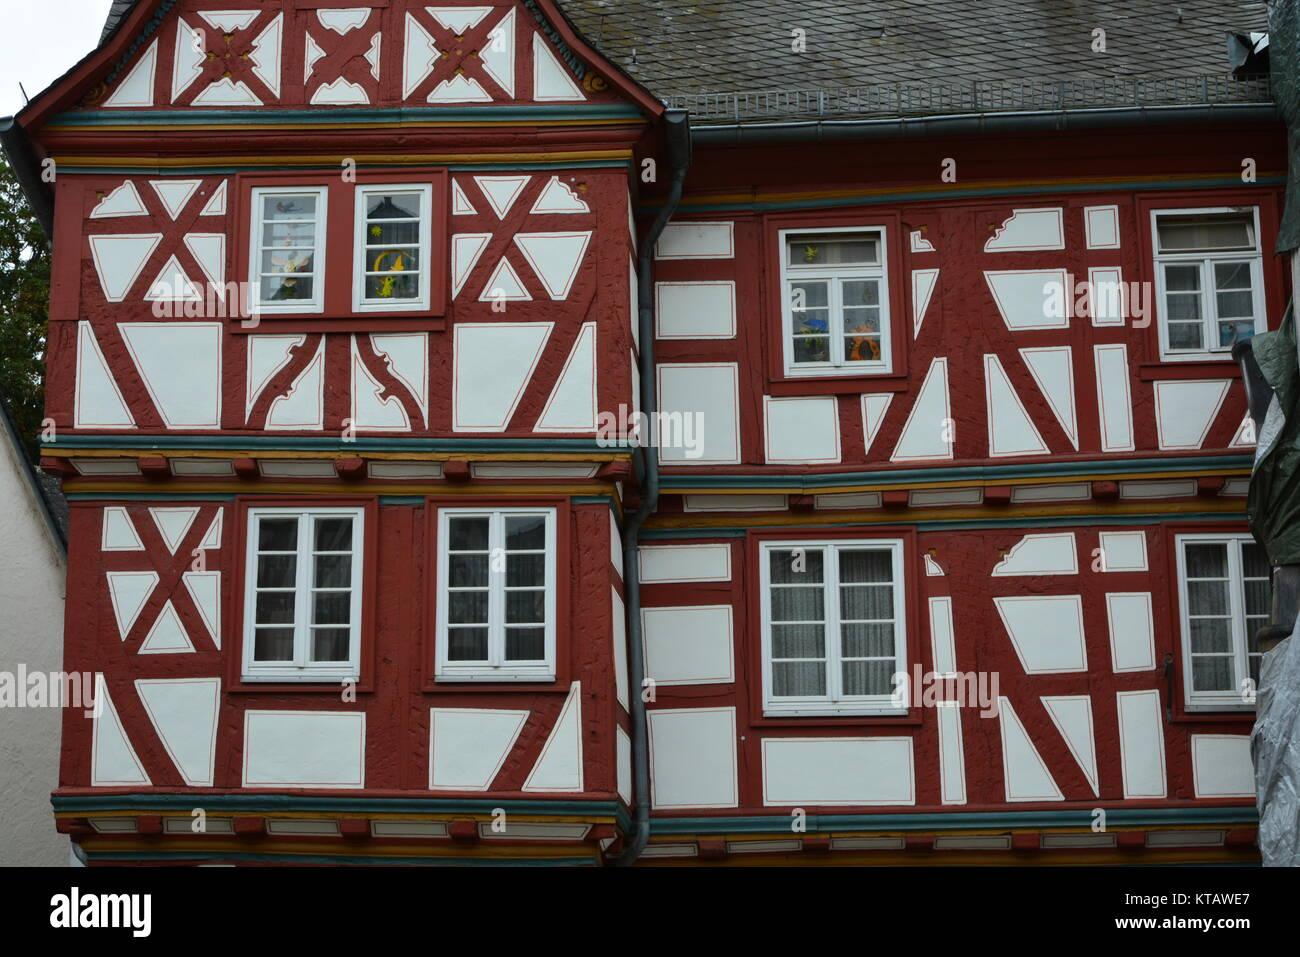 half-timbered house in limburg an der lahn Stock Photo